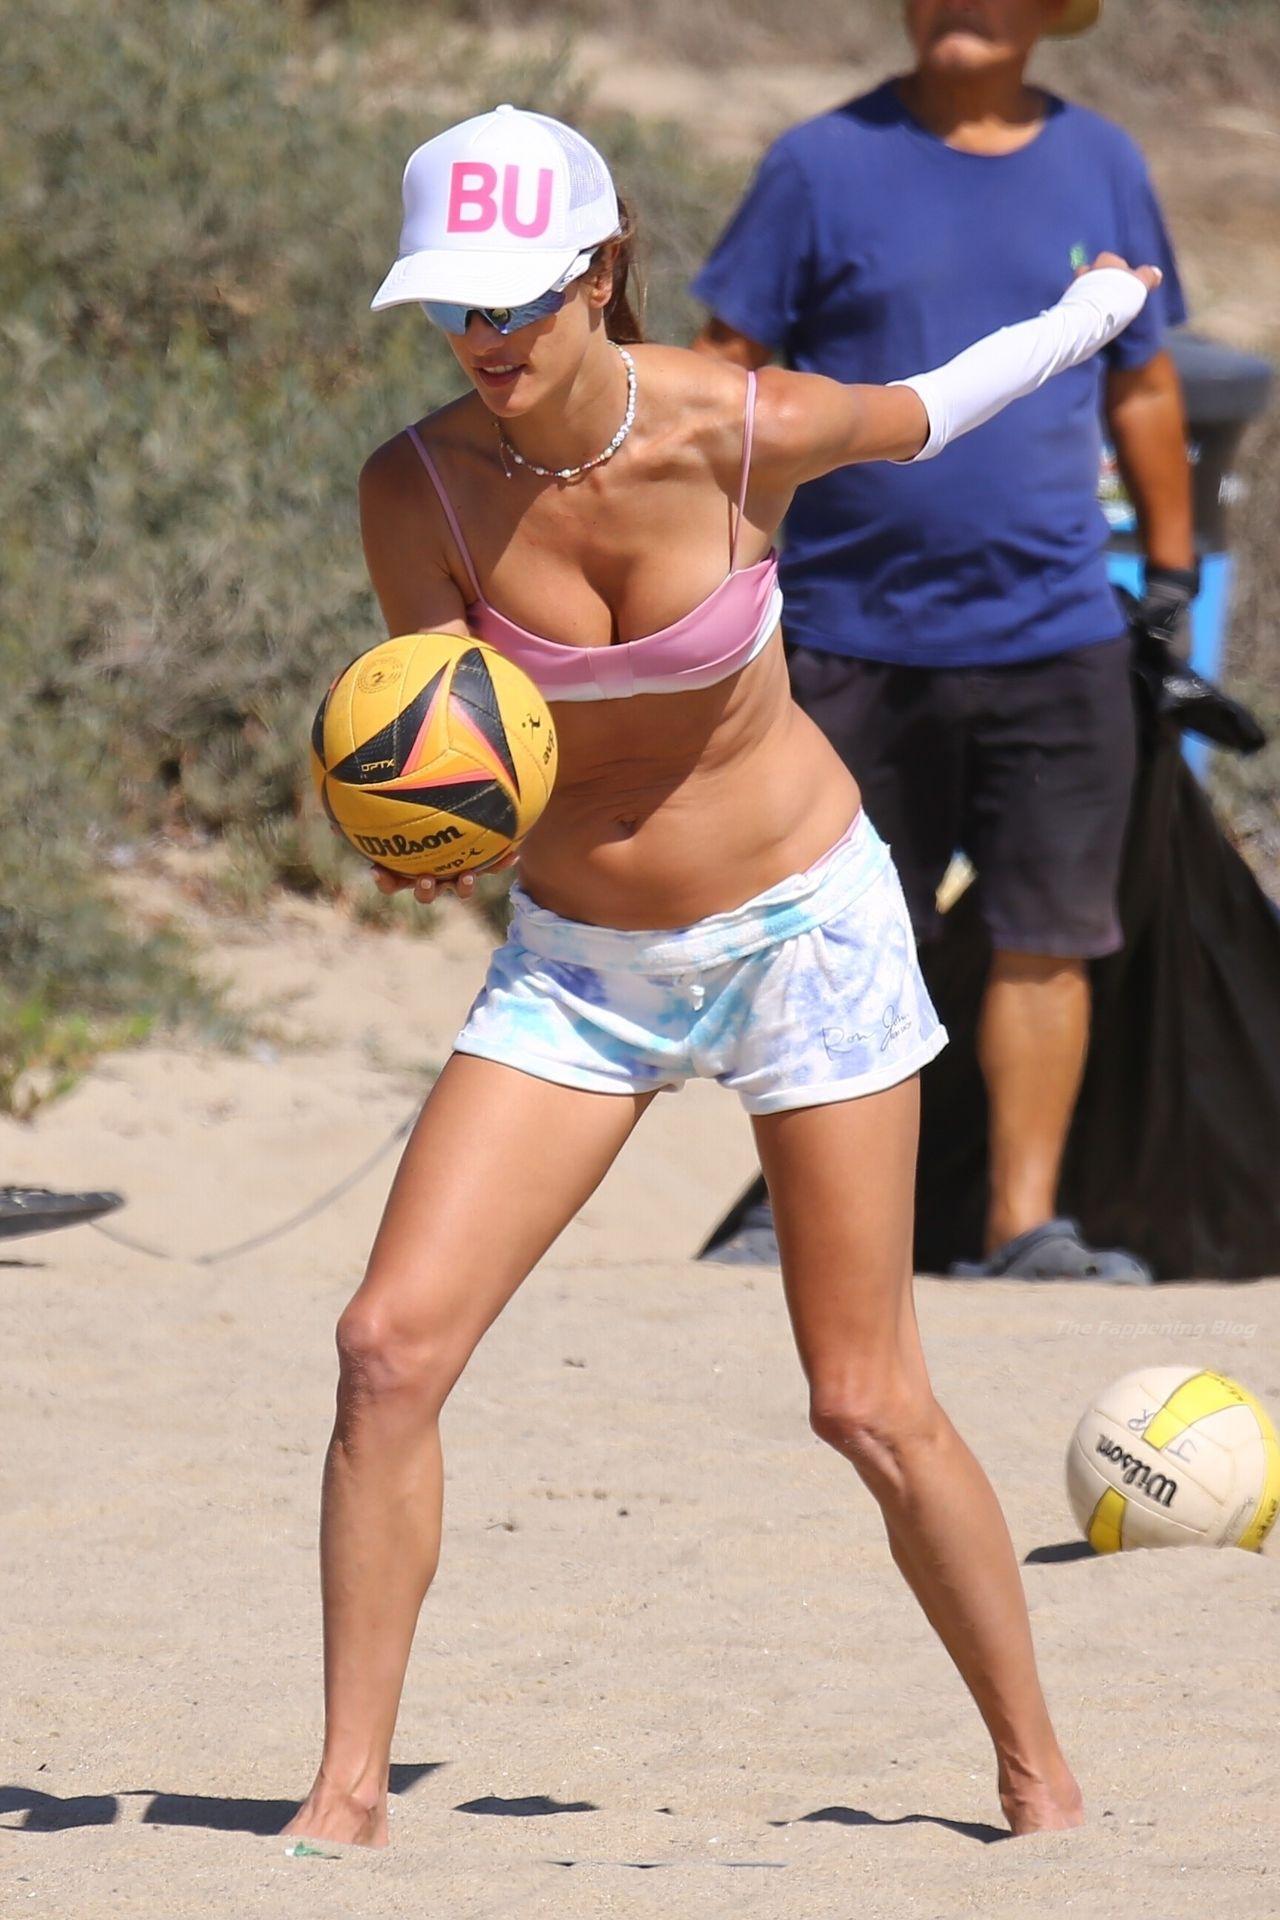 Alessandra-Ambrosio-Sexy-The-Fappening-Blog-9-2.jpg